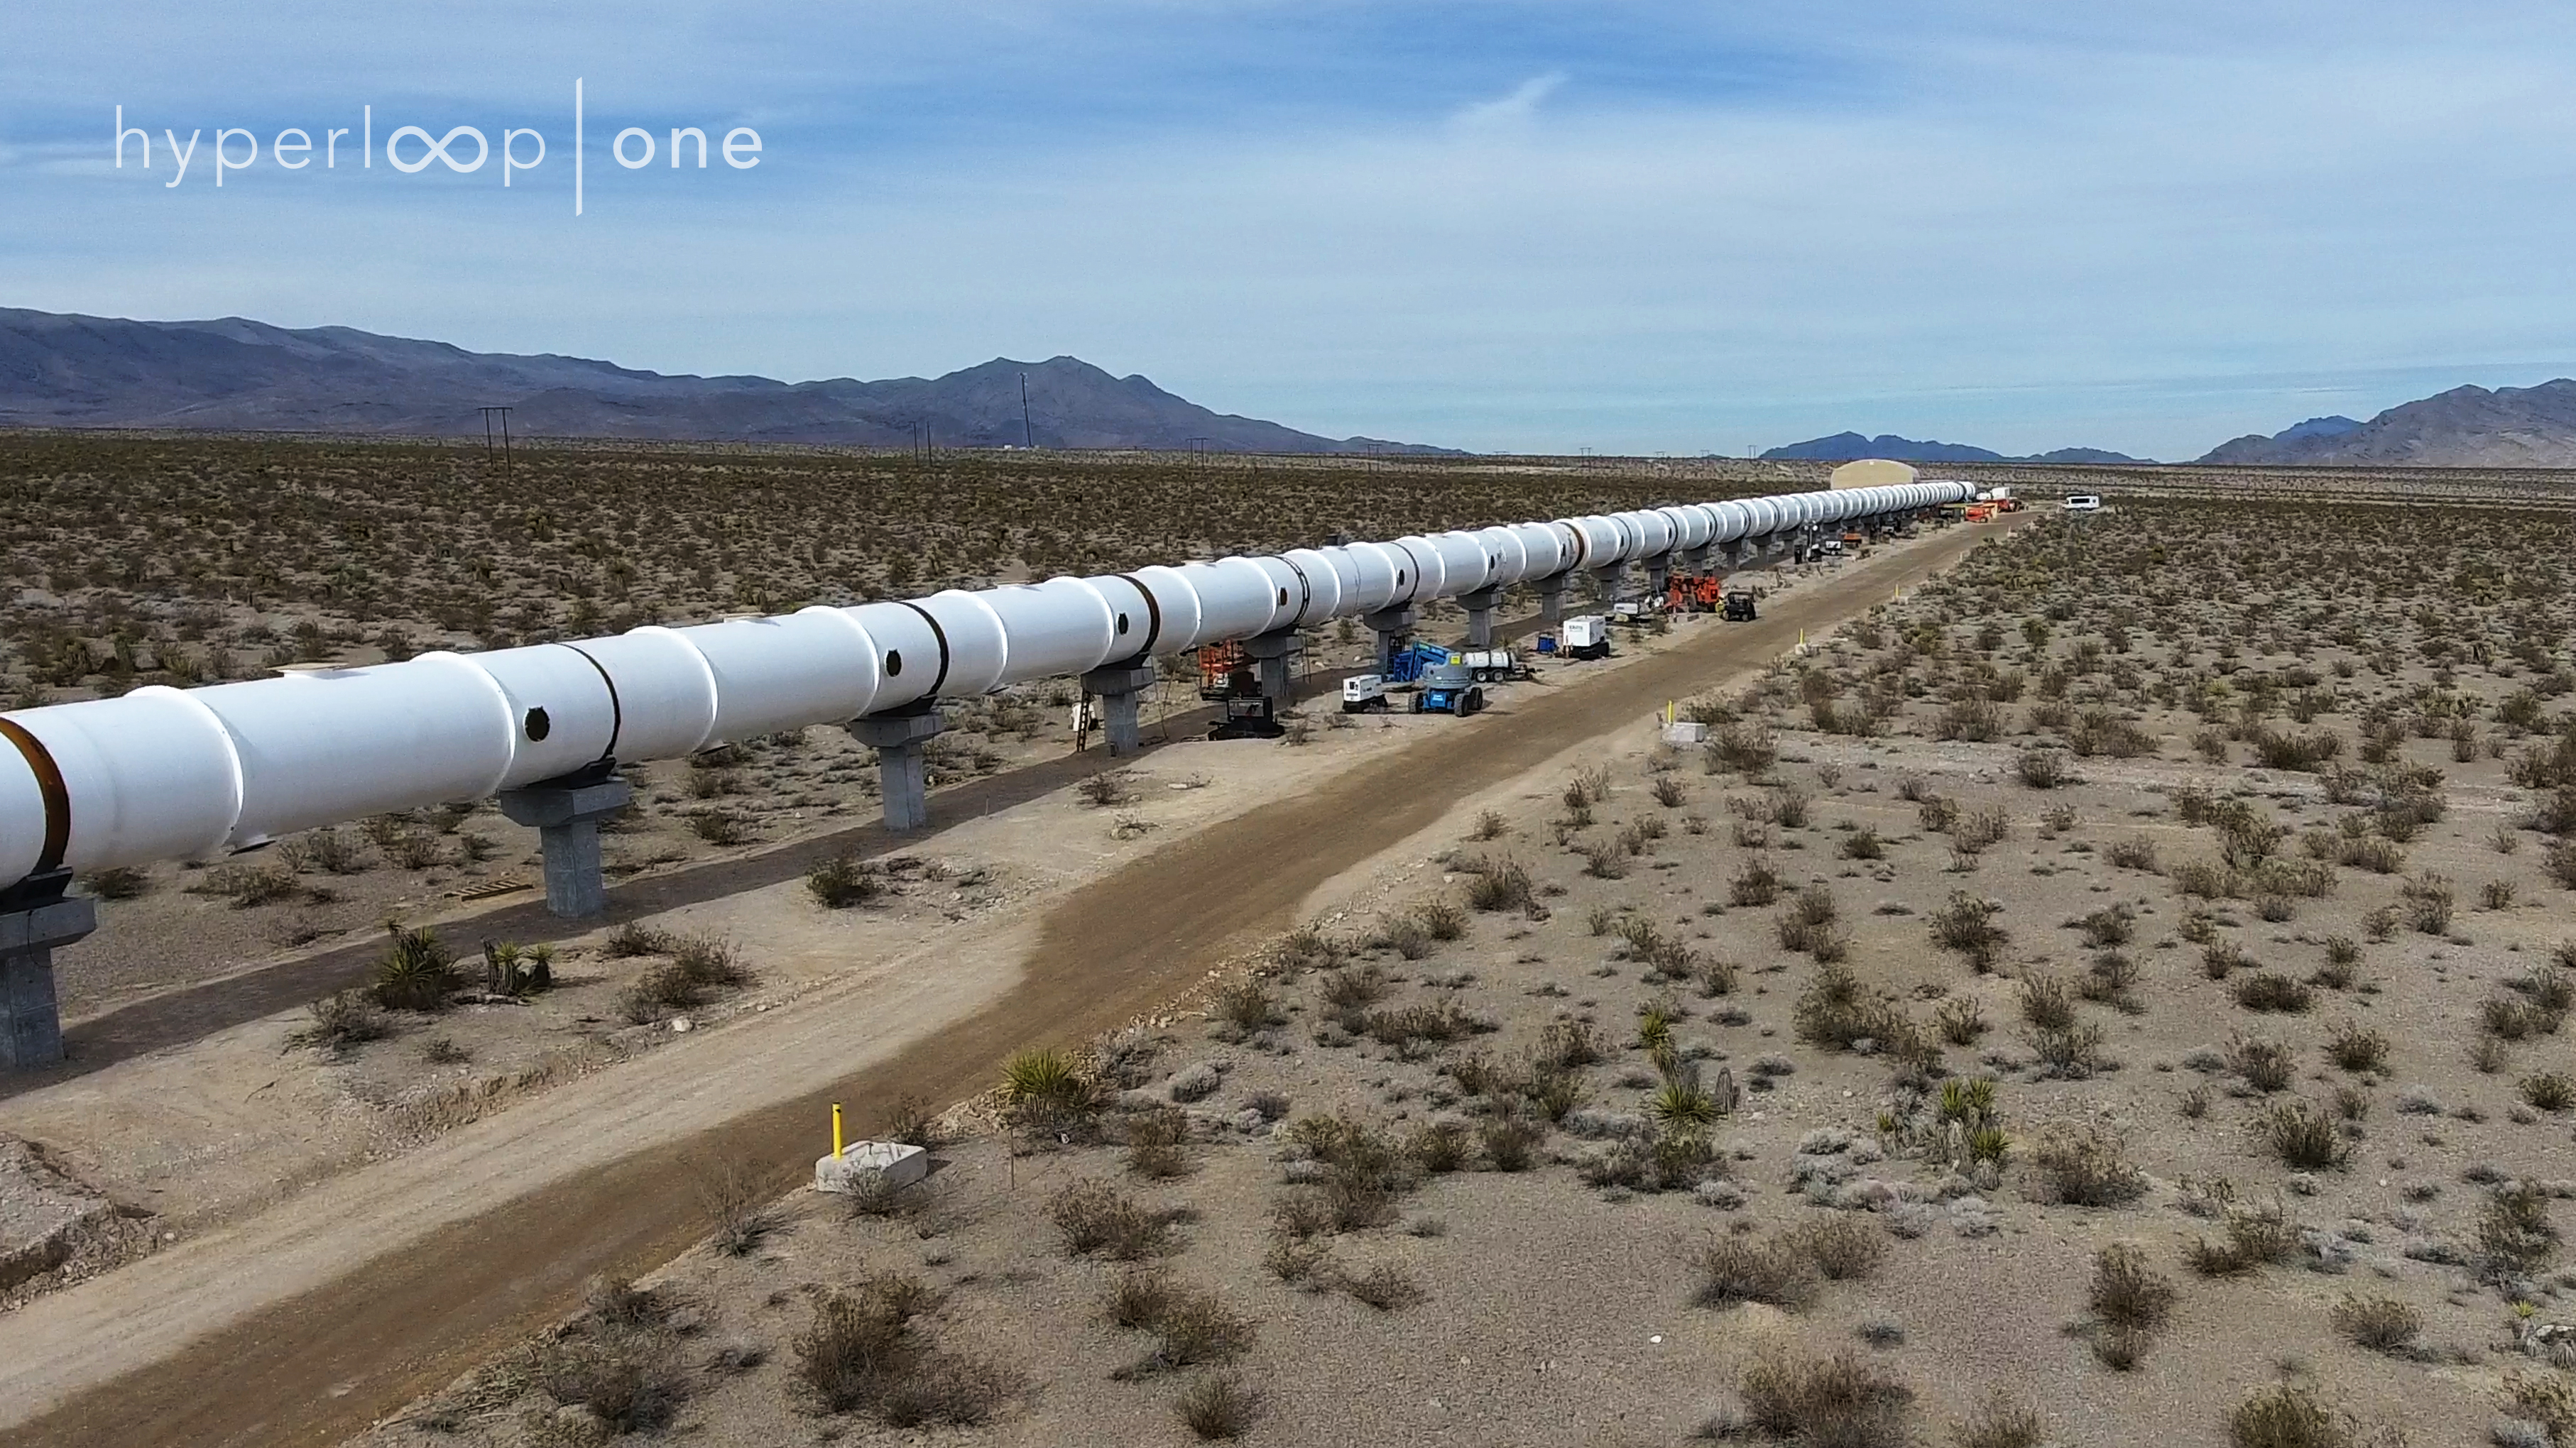 Hyperloop NY-DC Time travel